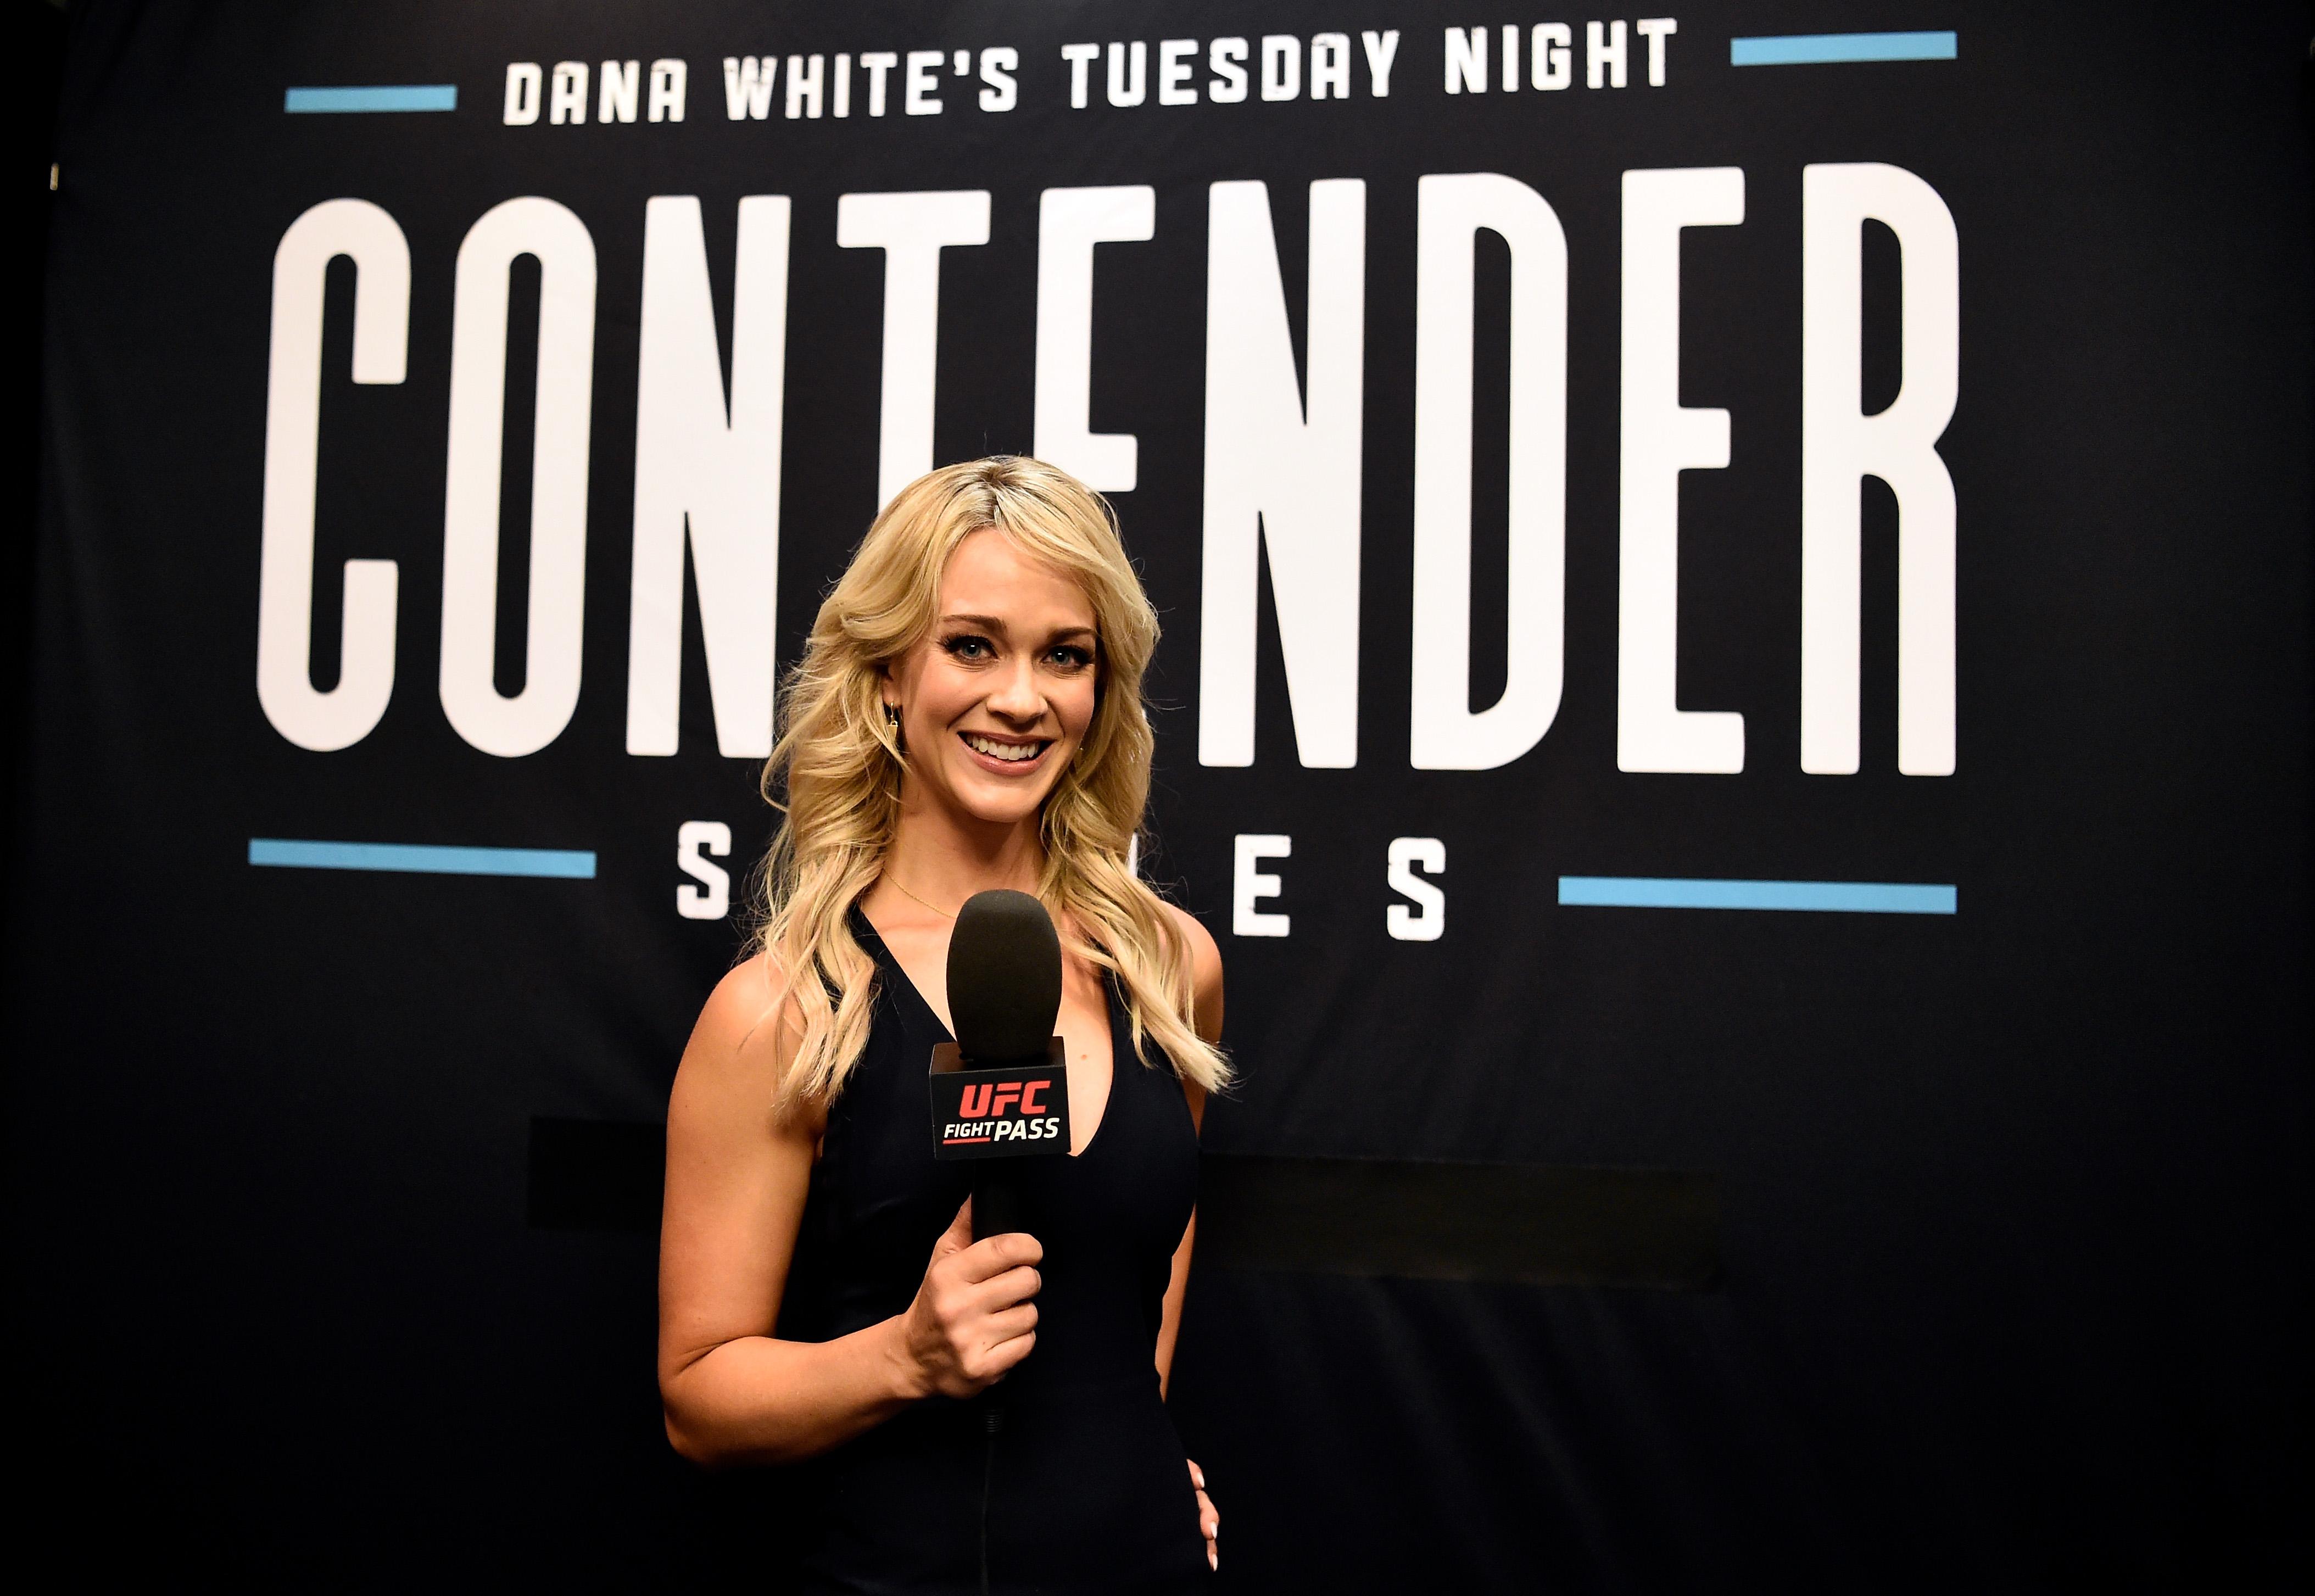 Dana White's Tuesday Night Contender Series: Holland v Santiago